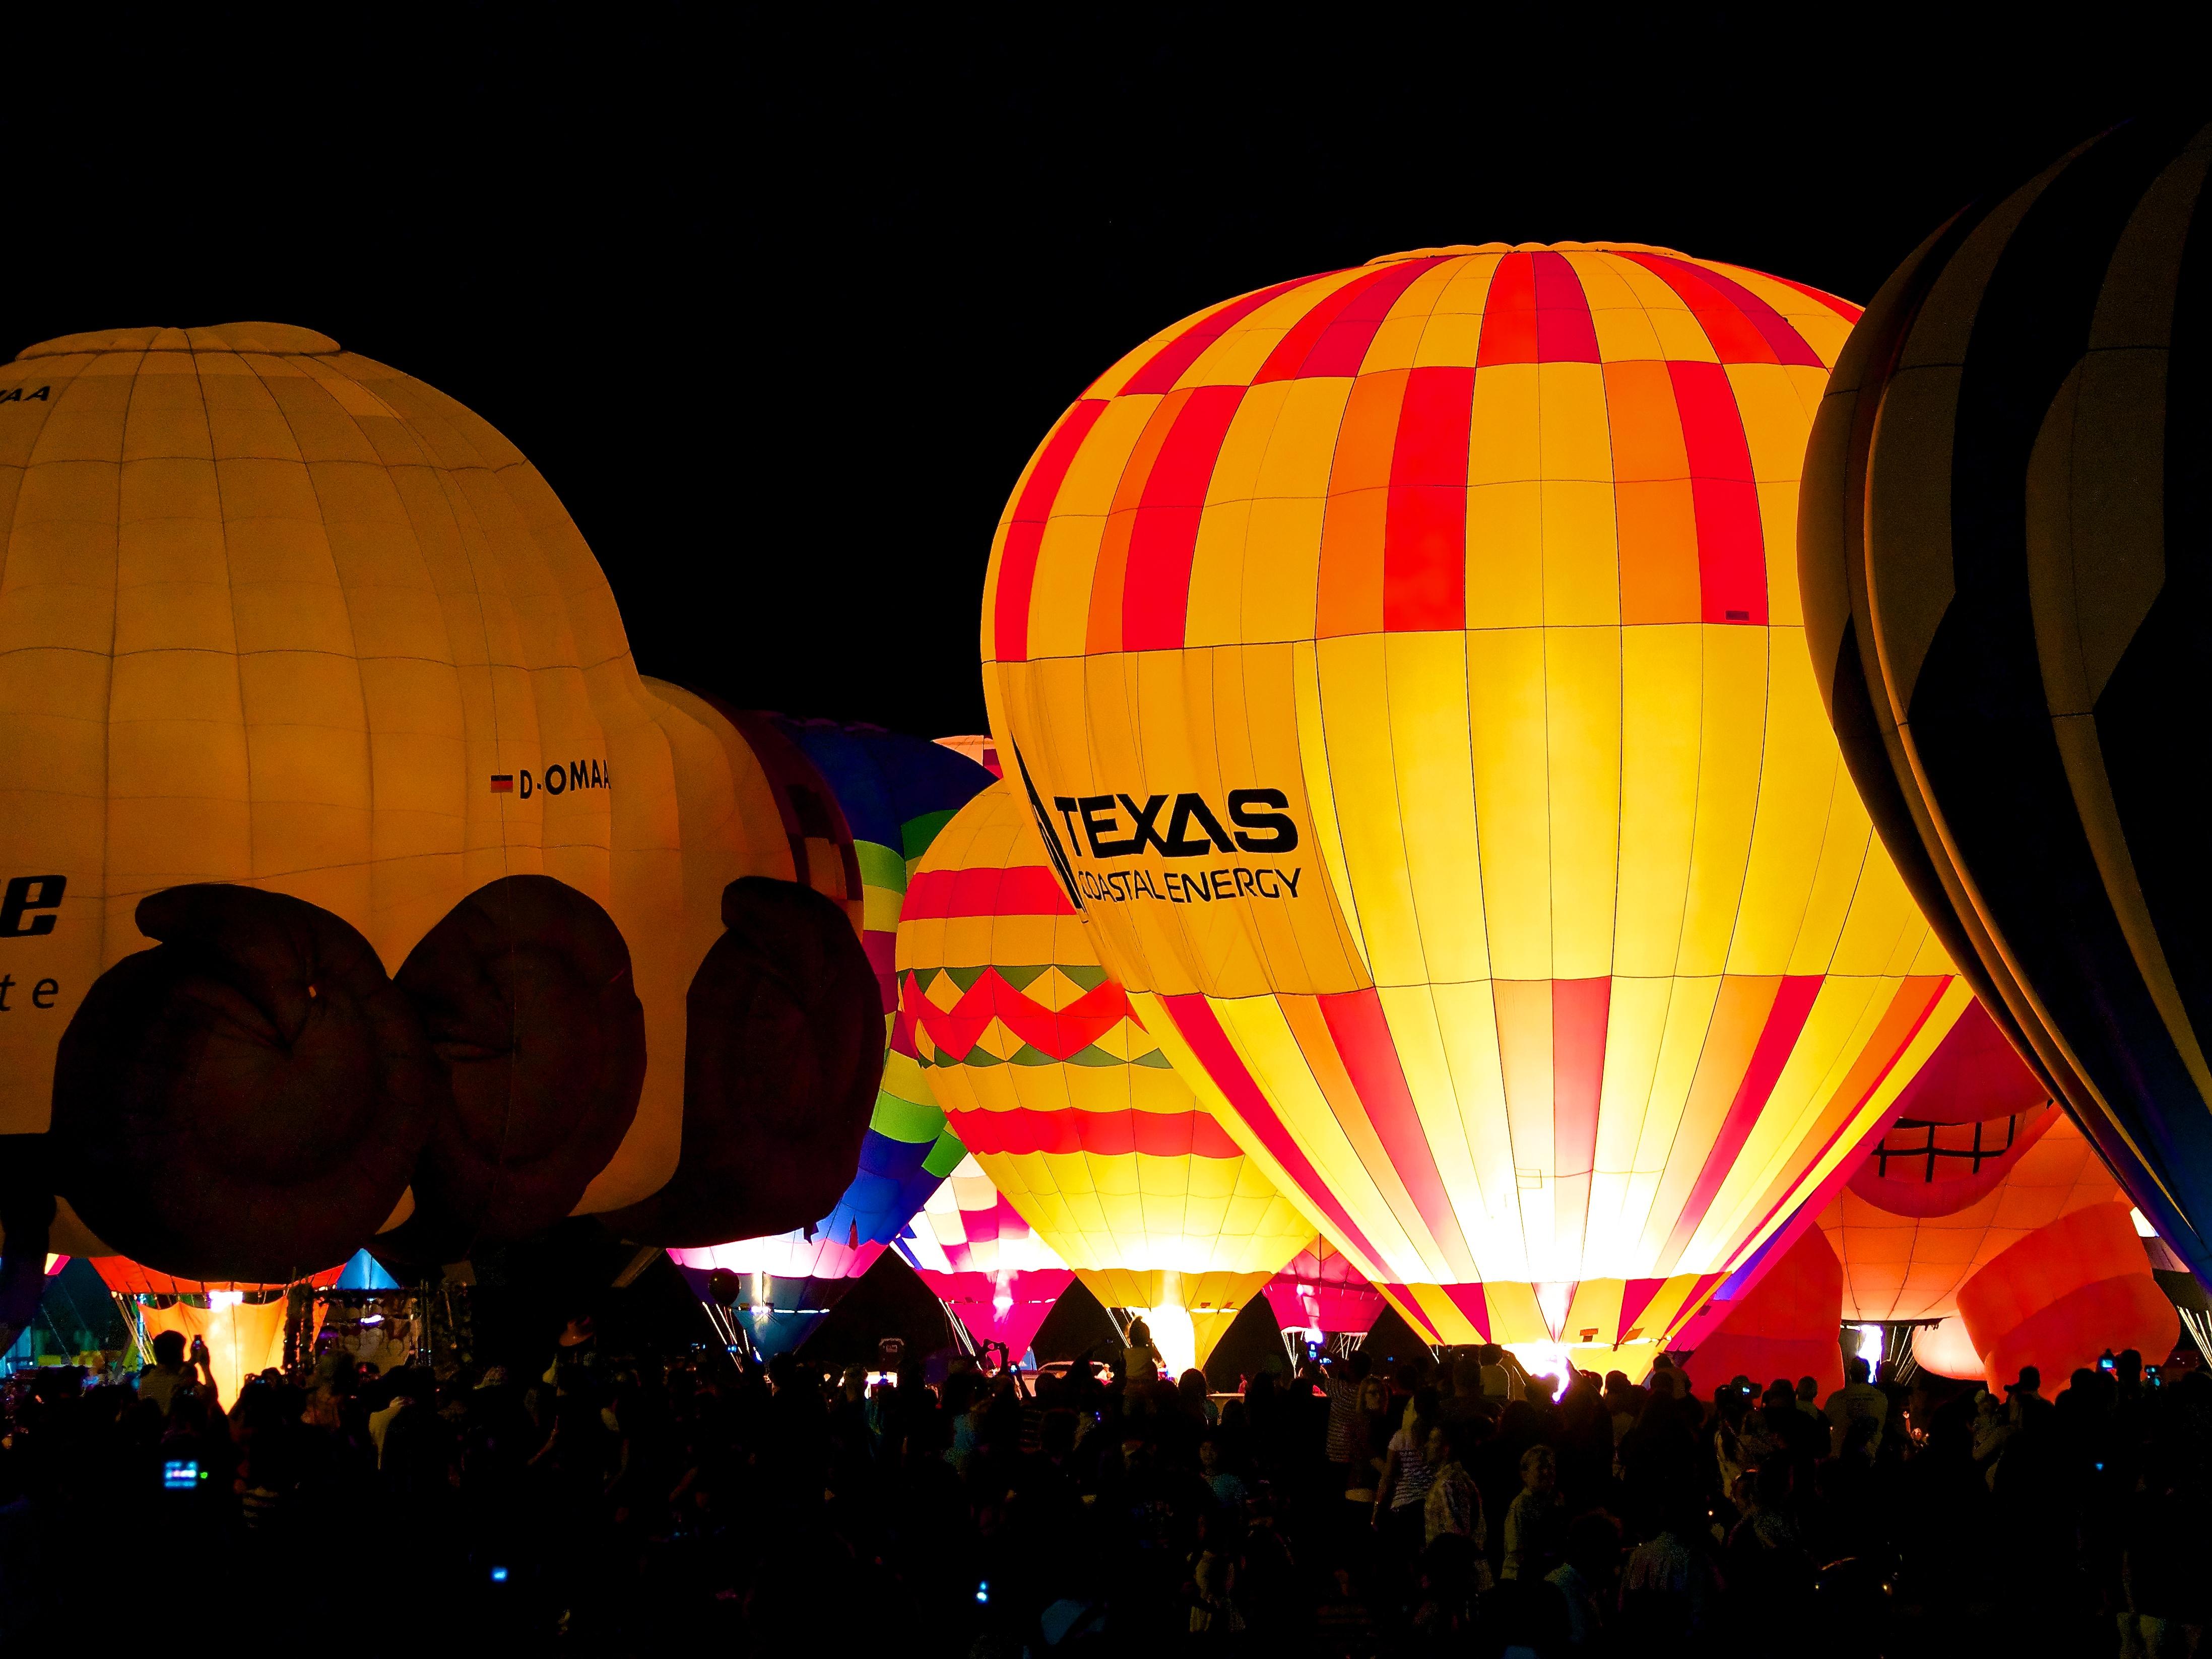 Good Wallpaper Night Hot Air Balloon - hot-air-ballooning-hot-air-balloon-night-balloon-light-atmosphere-of-earth-lighting-fun-sky-897217  Pic-376016.jpg